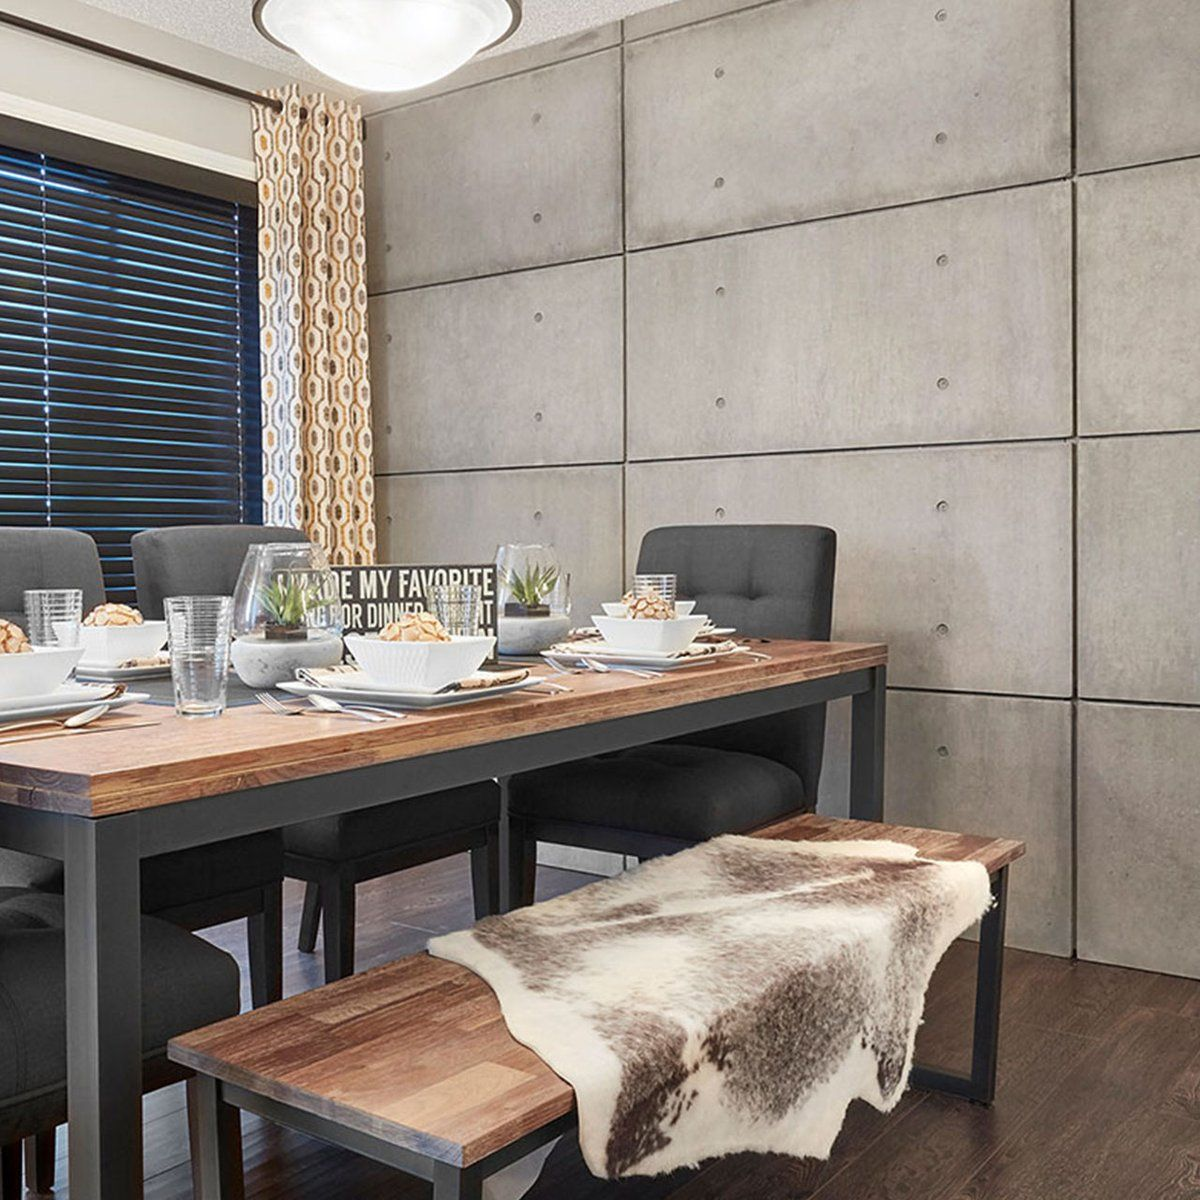 Diy Concrete Wall Panels Wall Cladding Interior Concrete Interiors Concrete Walls Diy